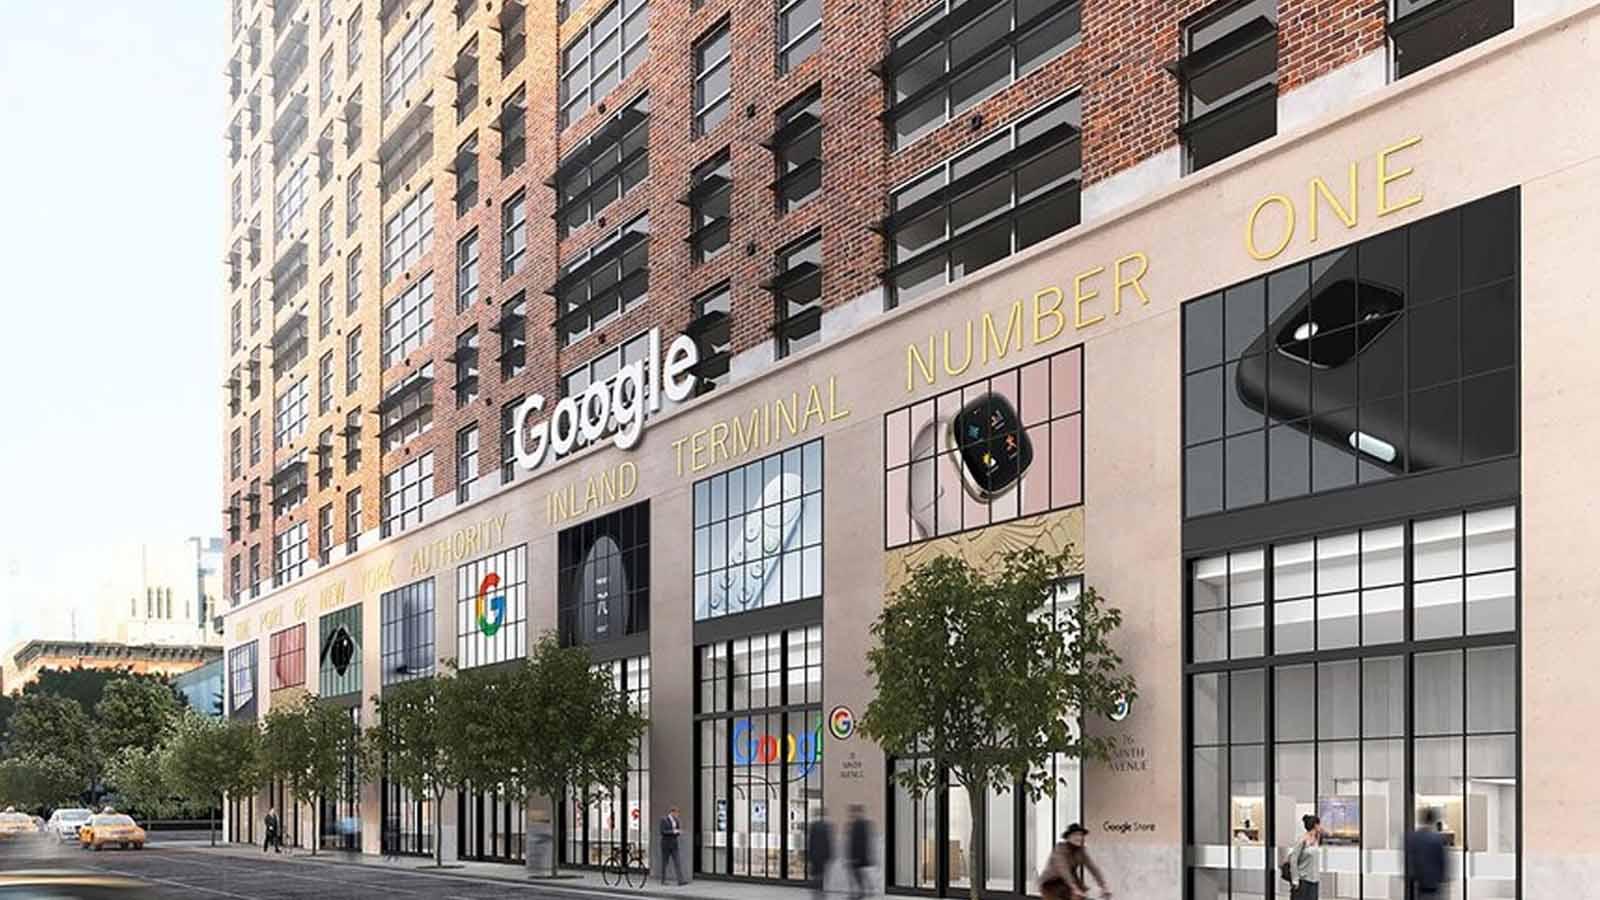 google store on street